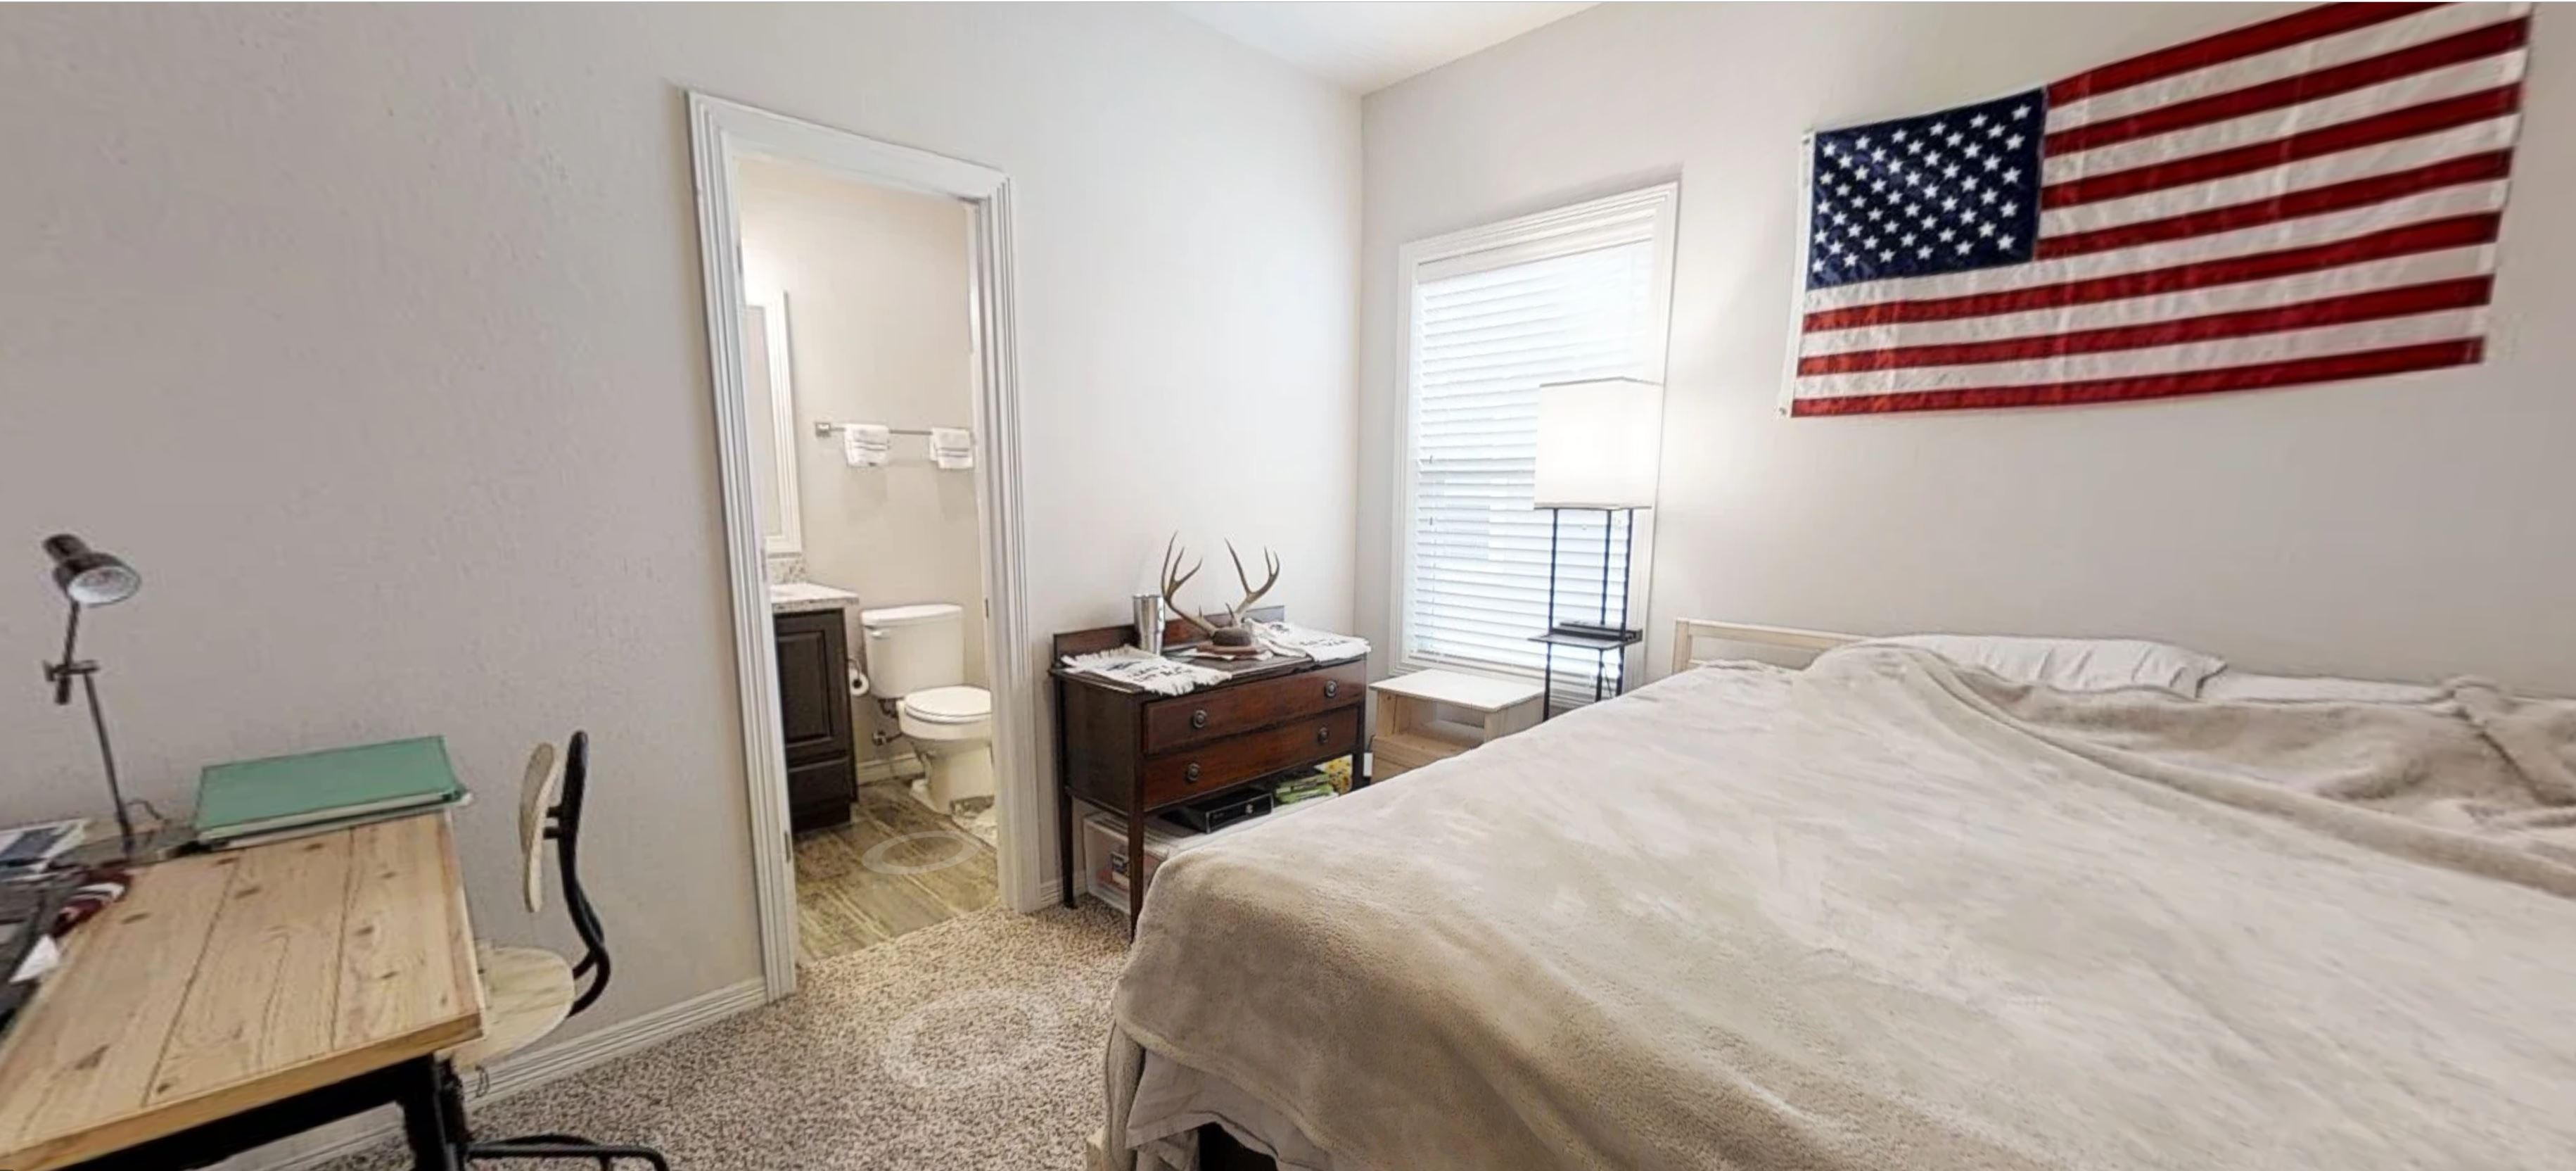 Nimitz Room3